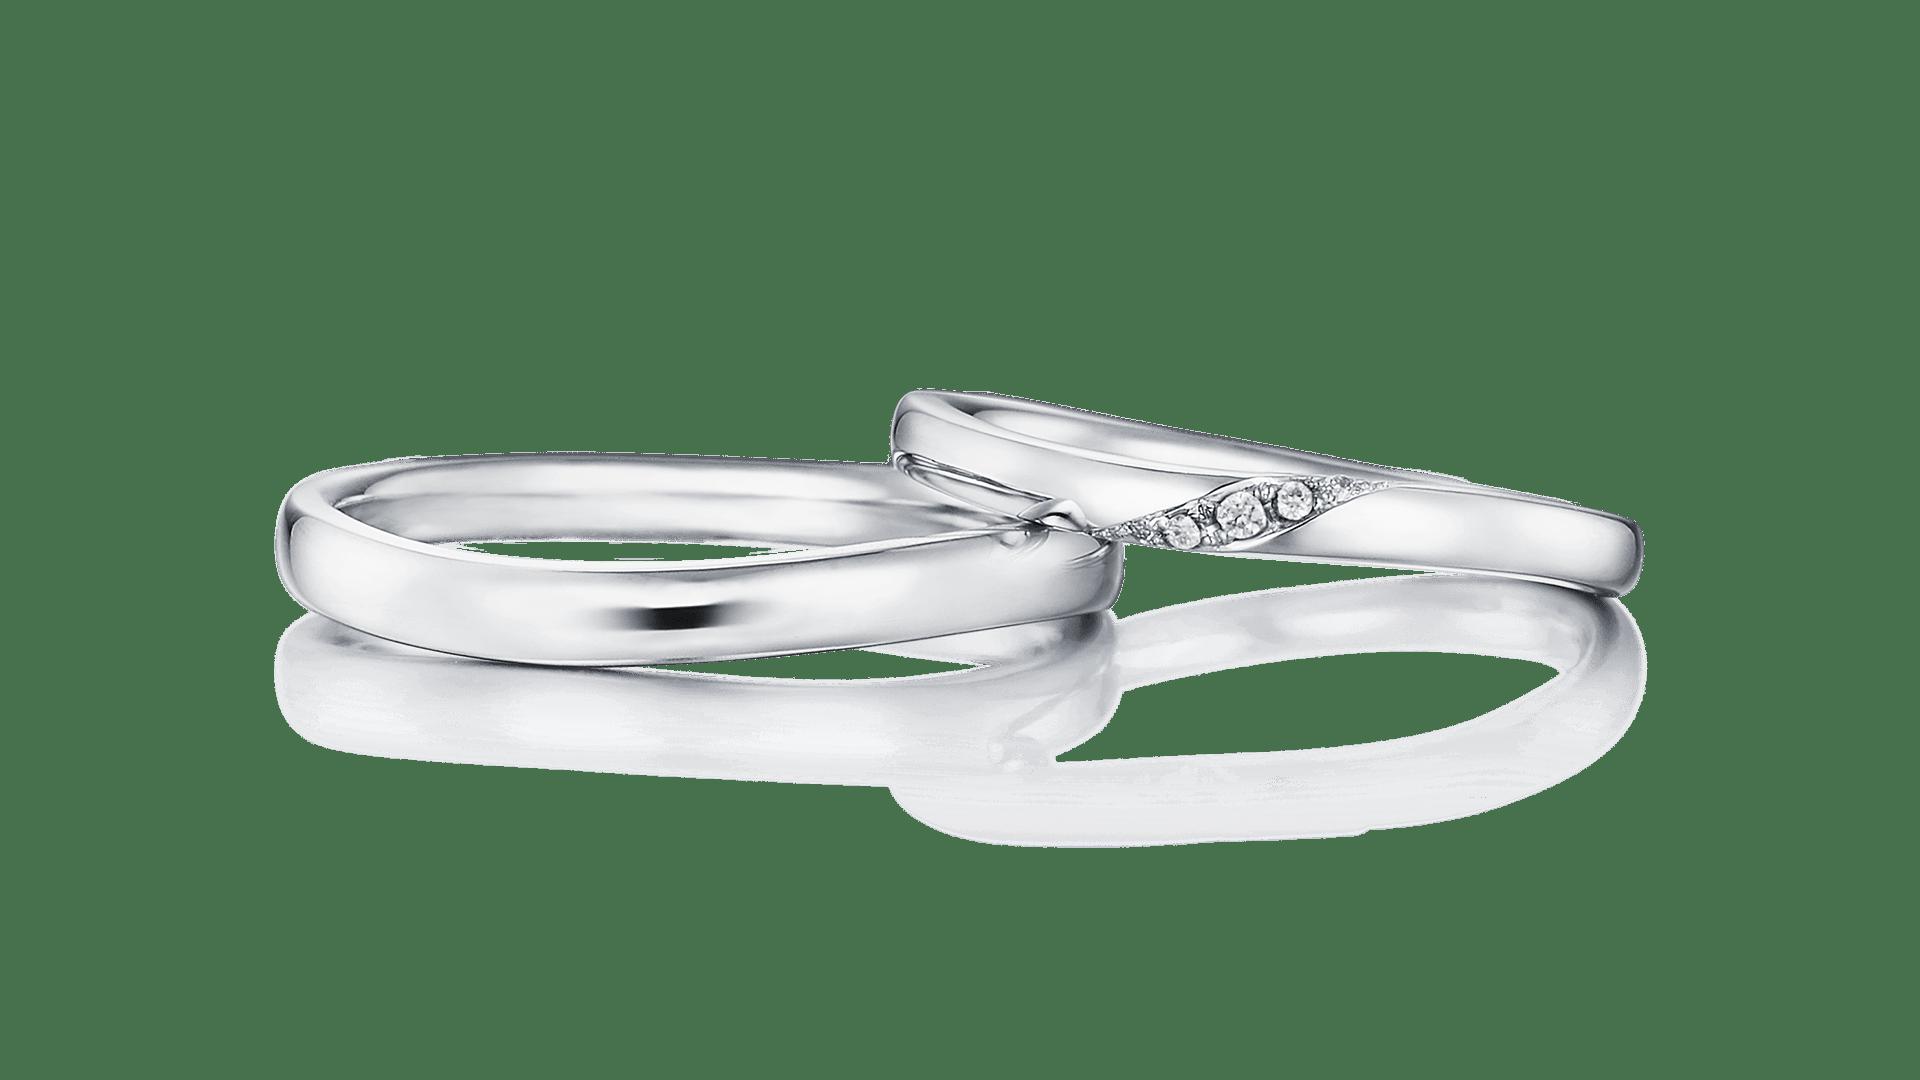 ceres ケレース   結婚指輪サムネイル 1